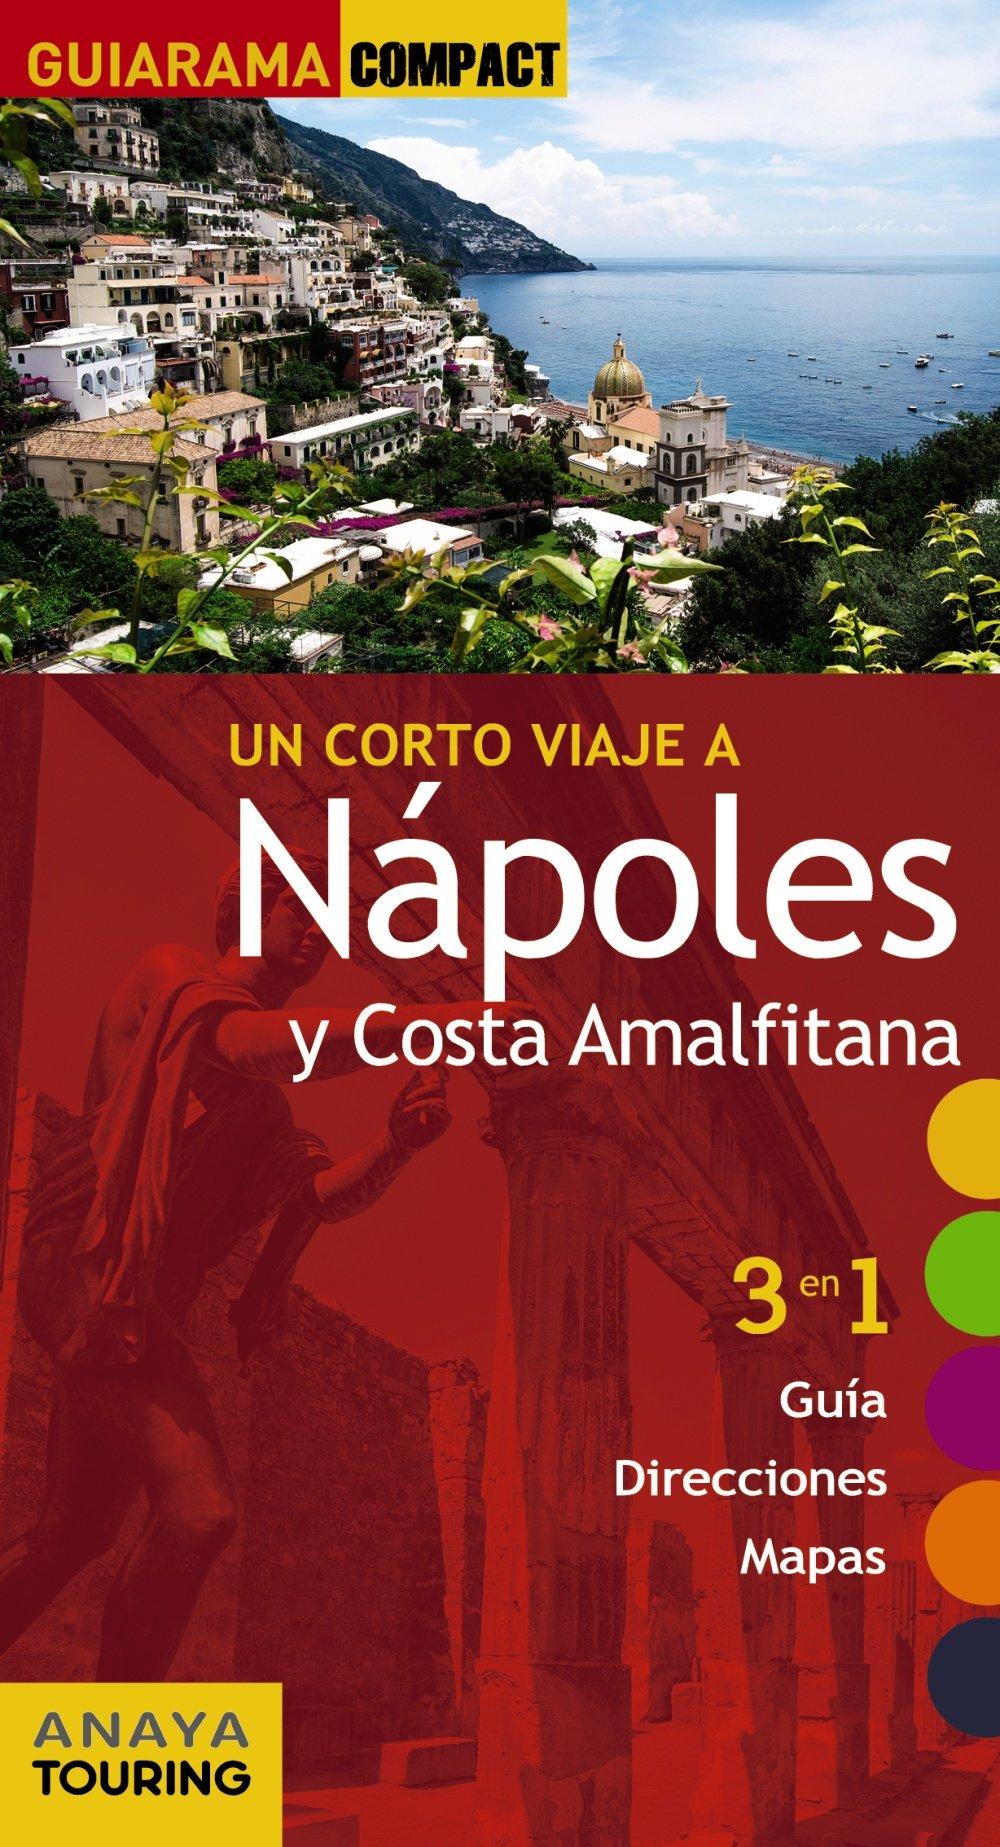 Nápoles y Costa Amalfitana (Guiarama Compact - Internacional) Tapa blanda – 2 feb 2017 Anaya Touring Begoña Pego del Río 8499359523 Italy